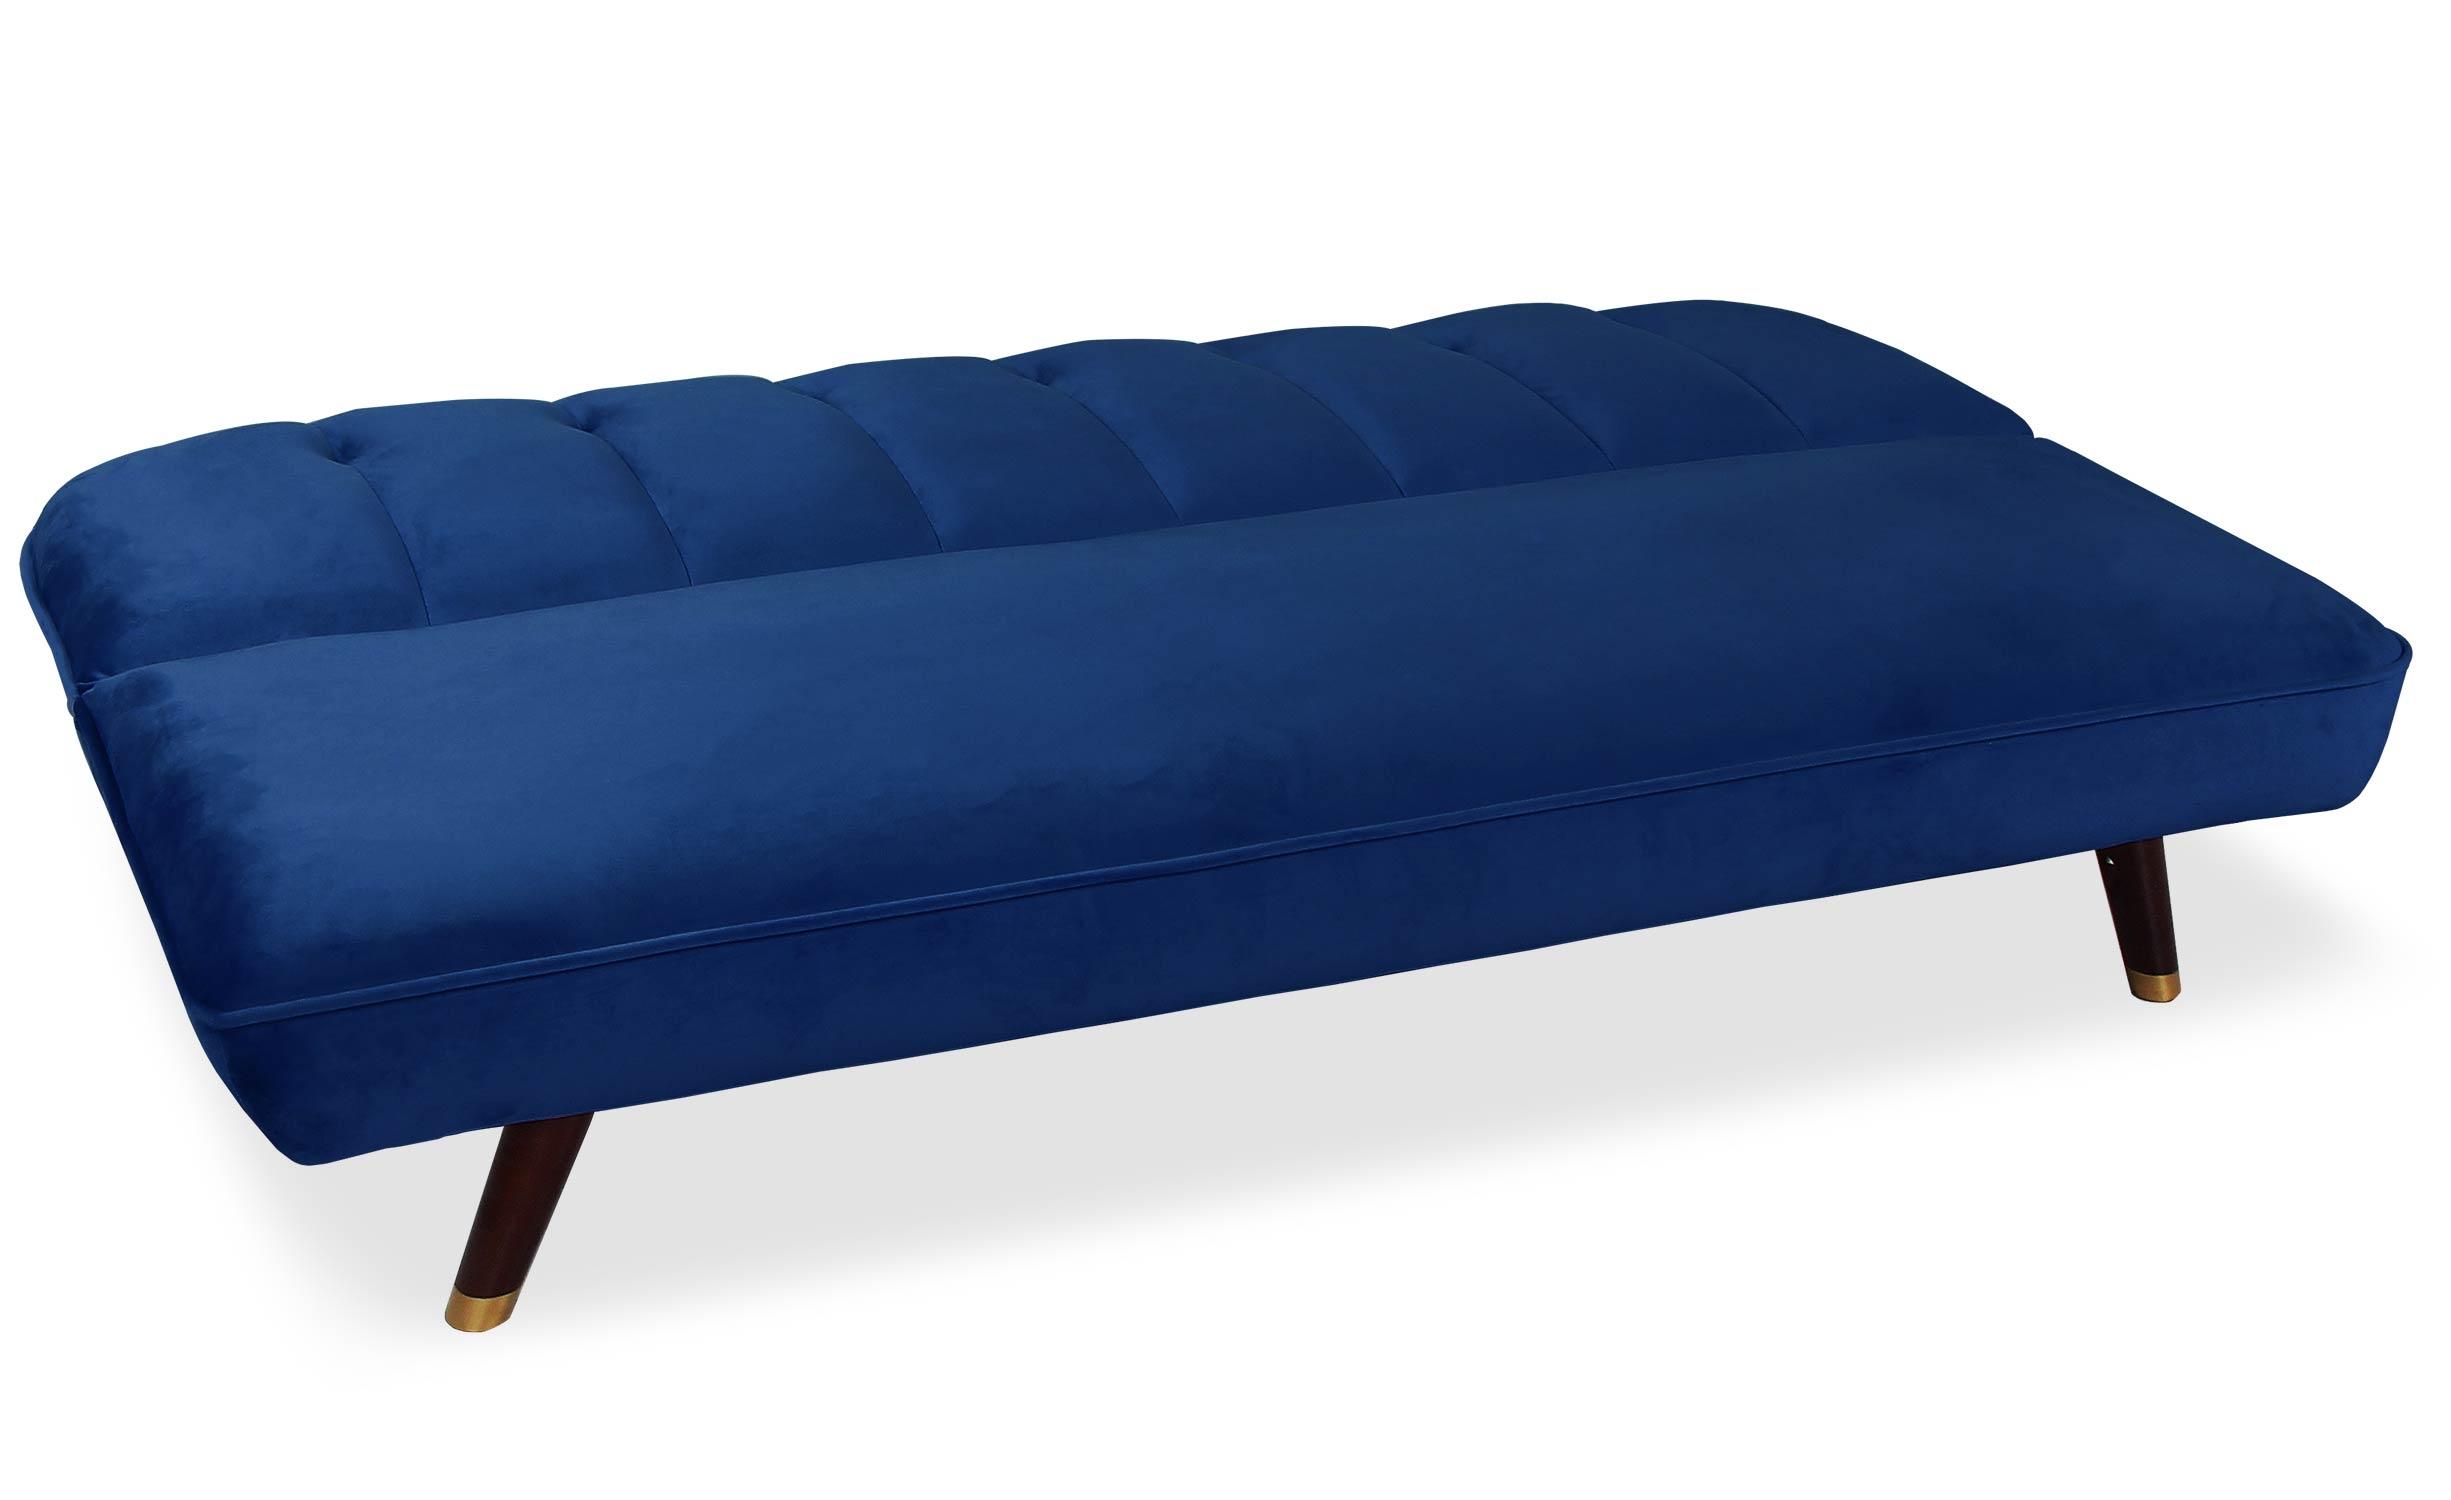 Slaapbank van blauw velours Olympia